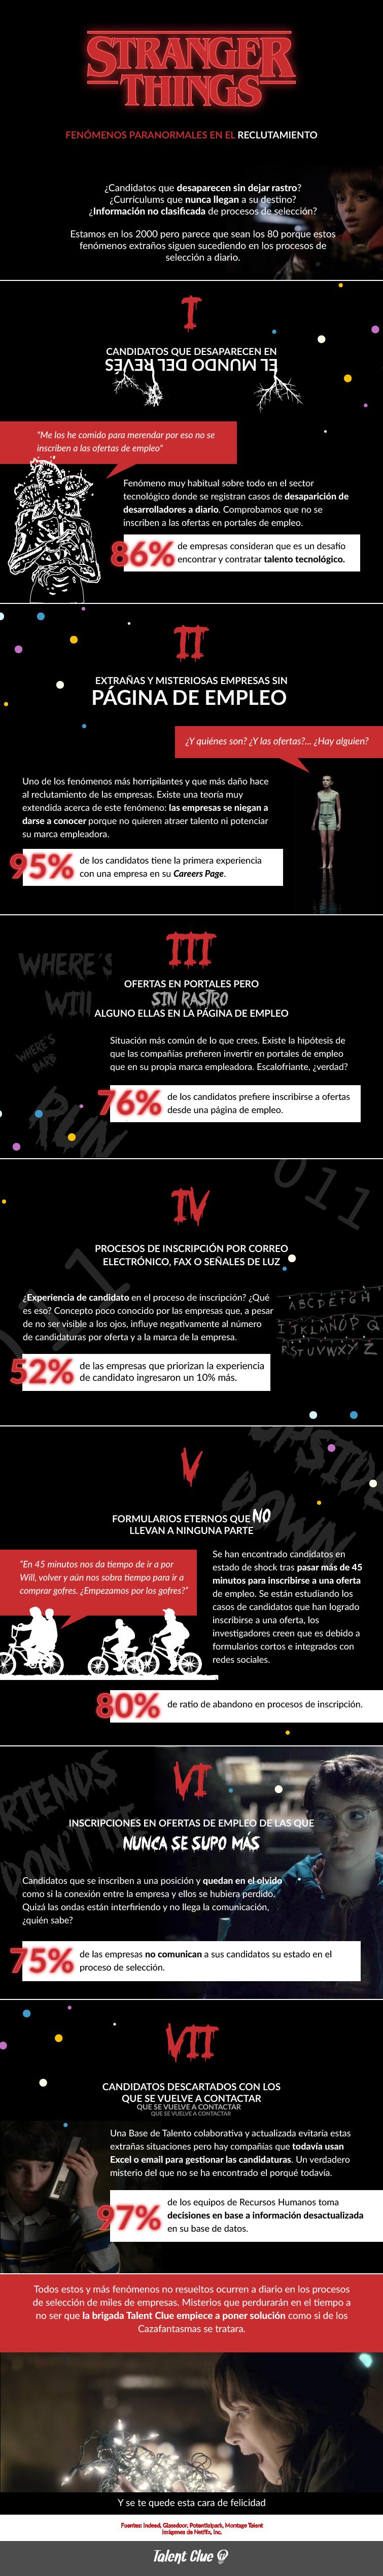 Talent Clue infografia